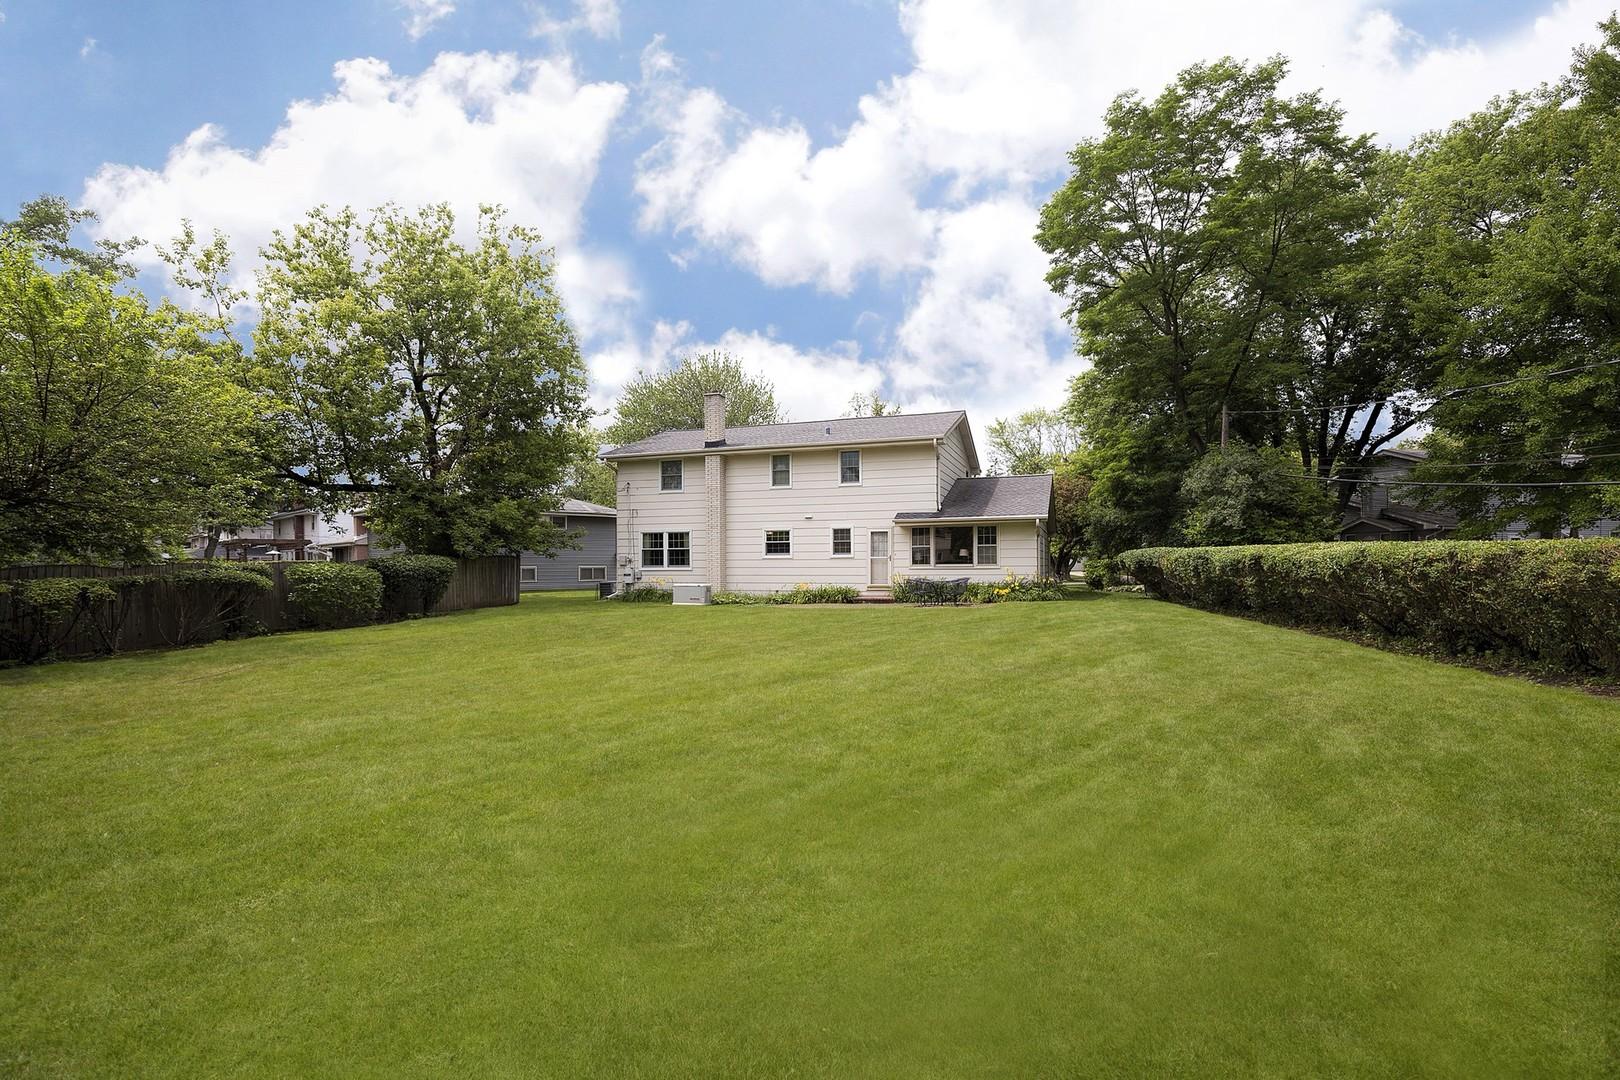 1635 Imperial, Glenview, Illinois, 60026